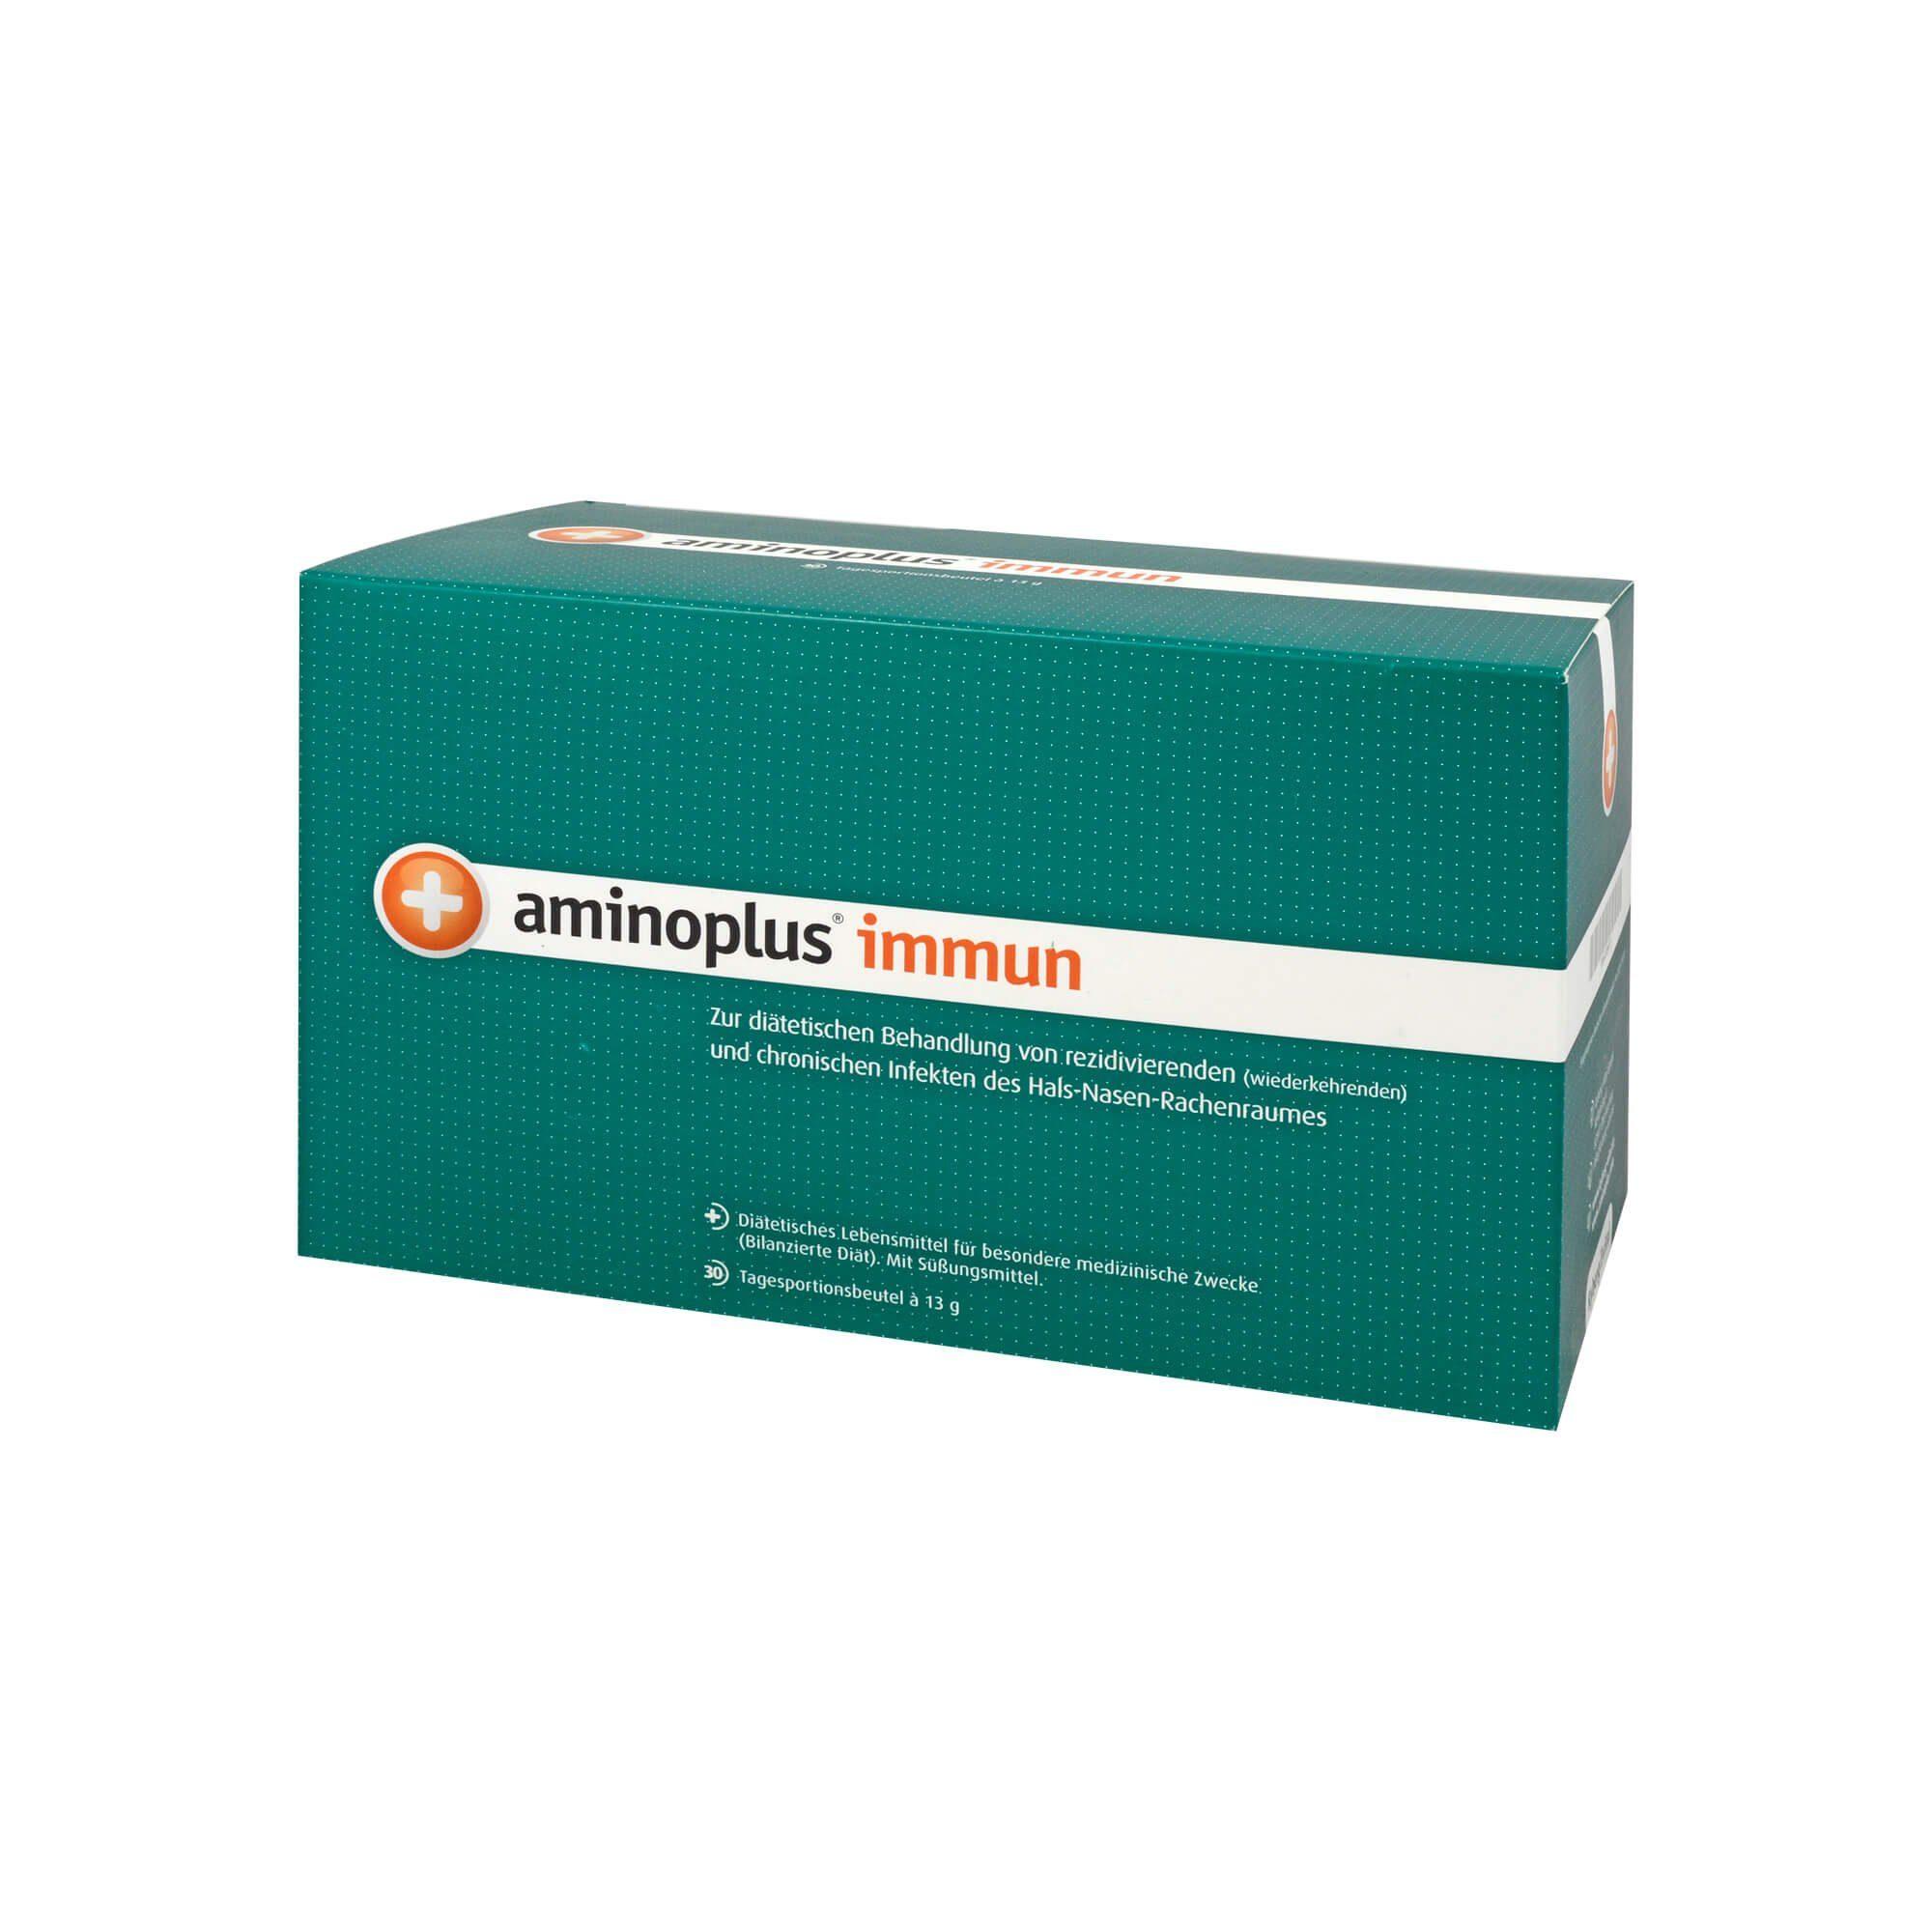 Aminoplus Immun Granulat , 30 St